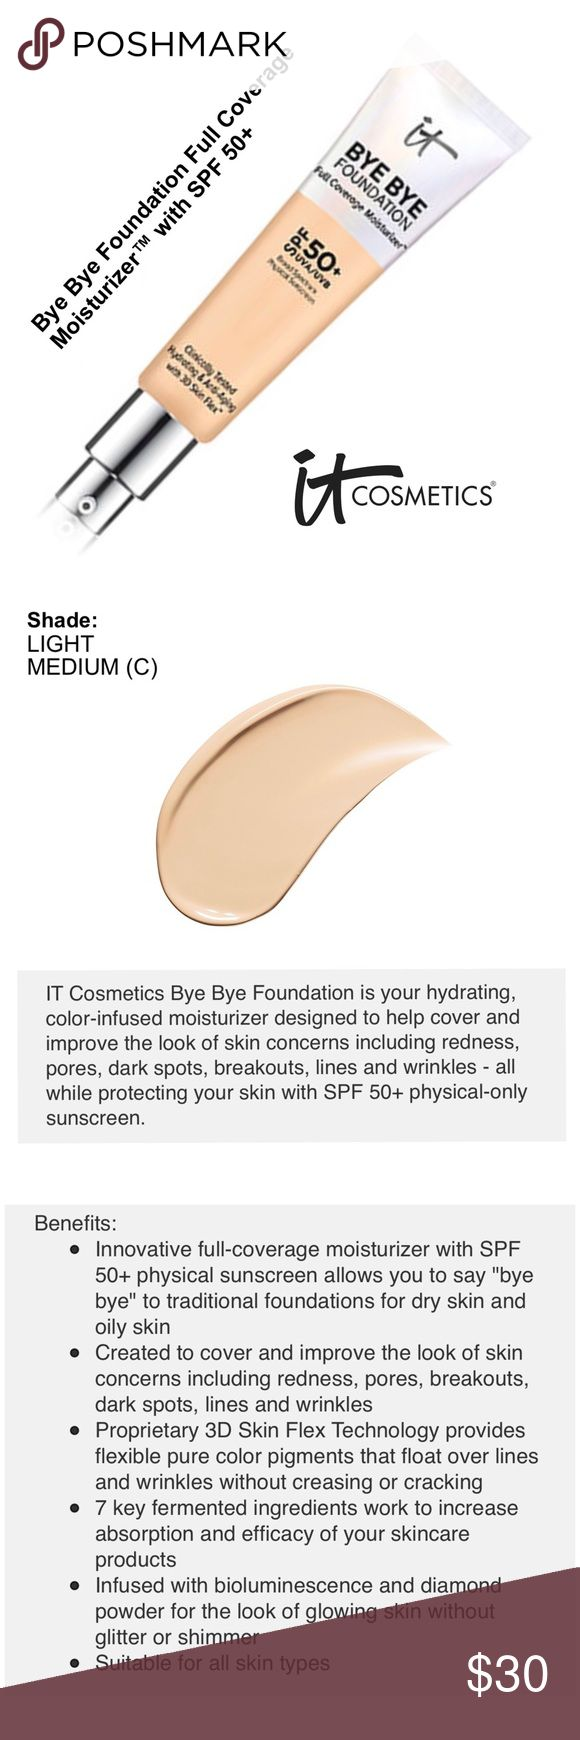 IT COSMETICS Bye Bye Foundation NWT Makeup items